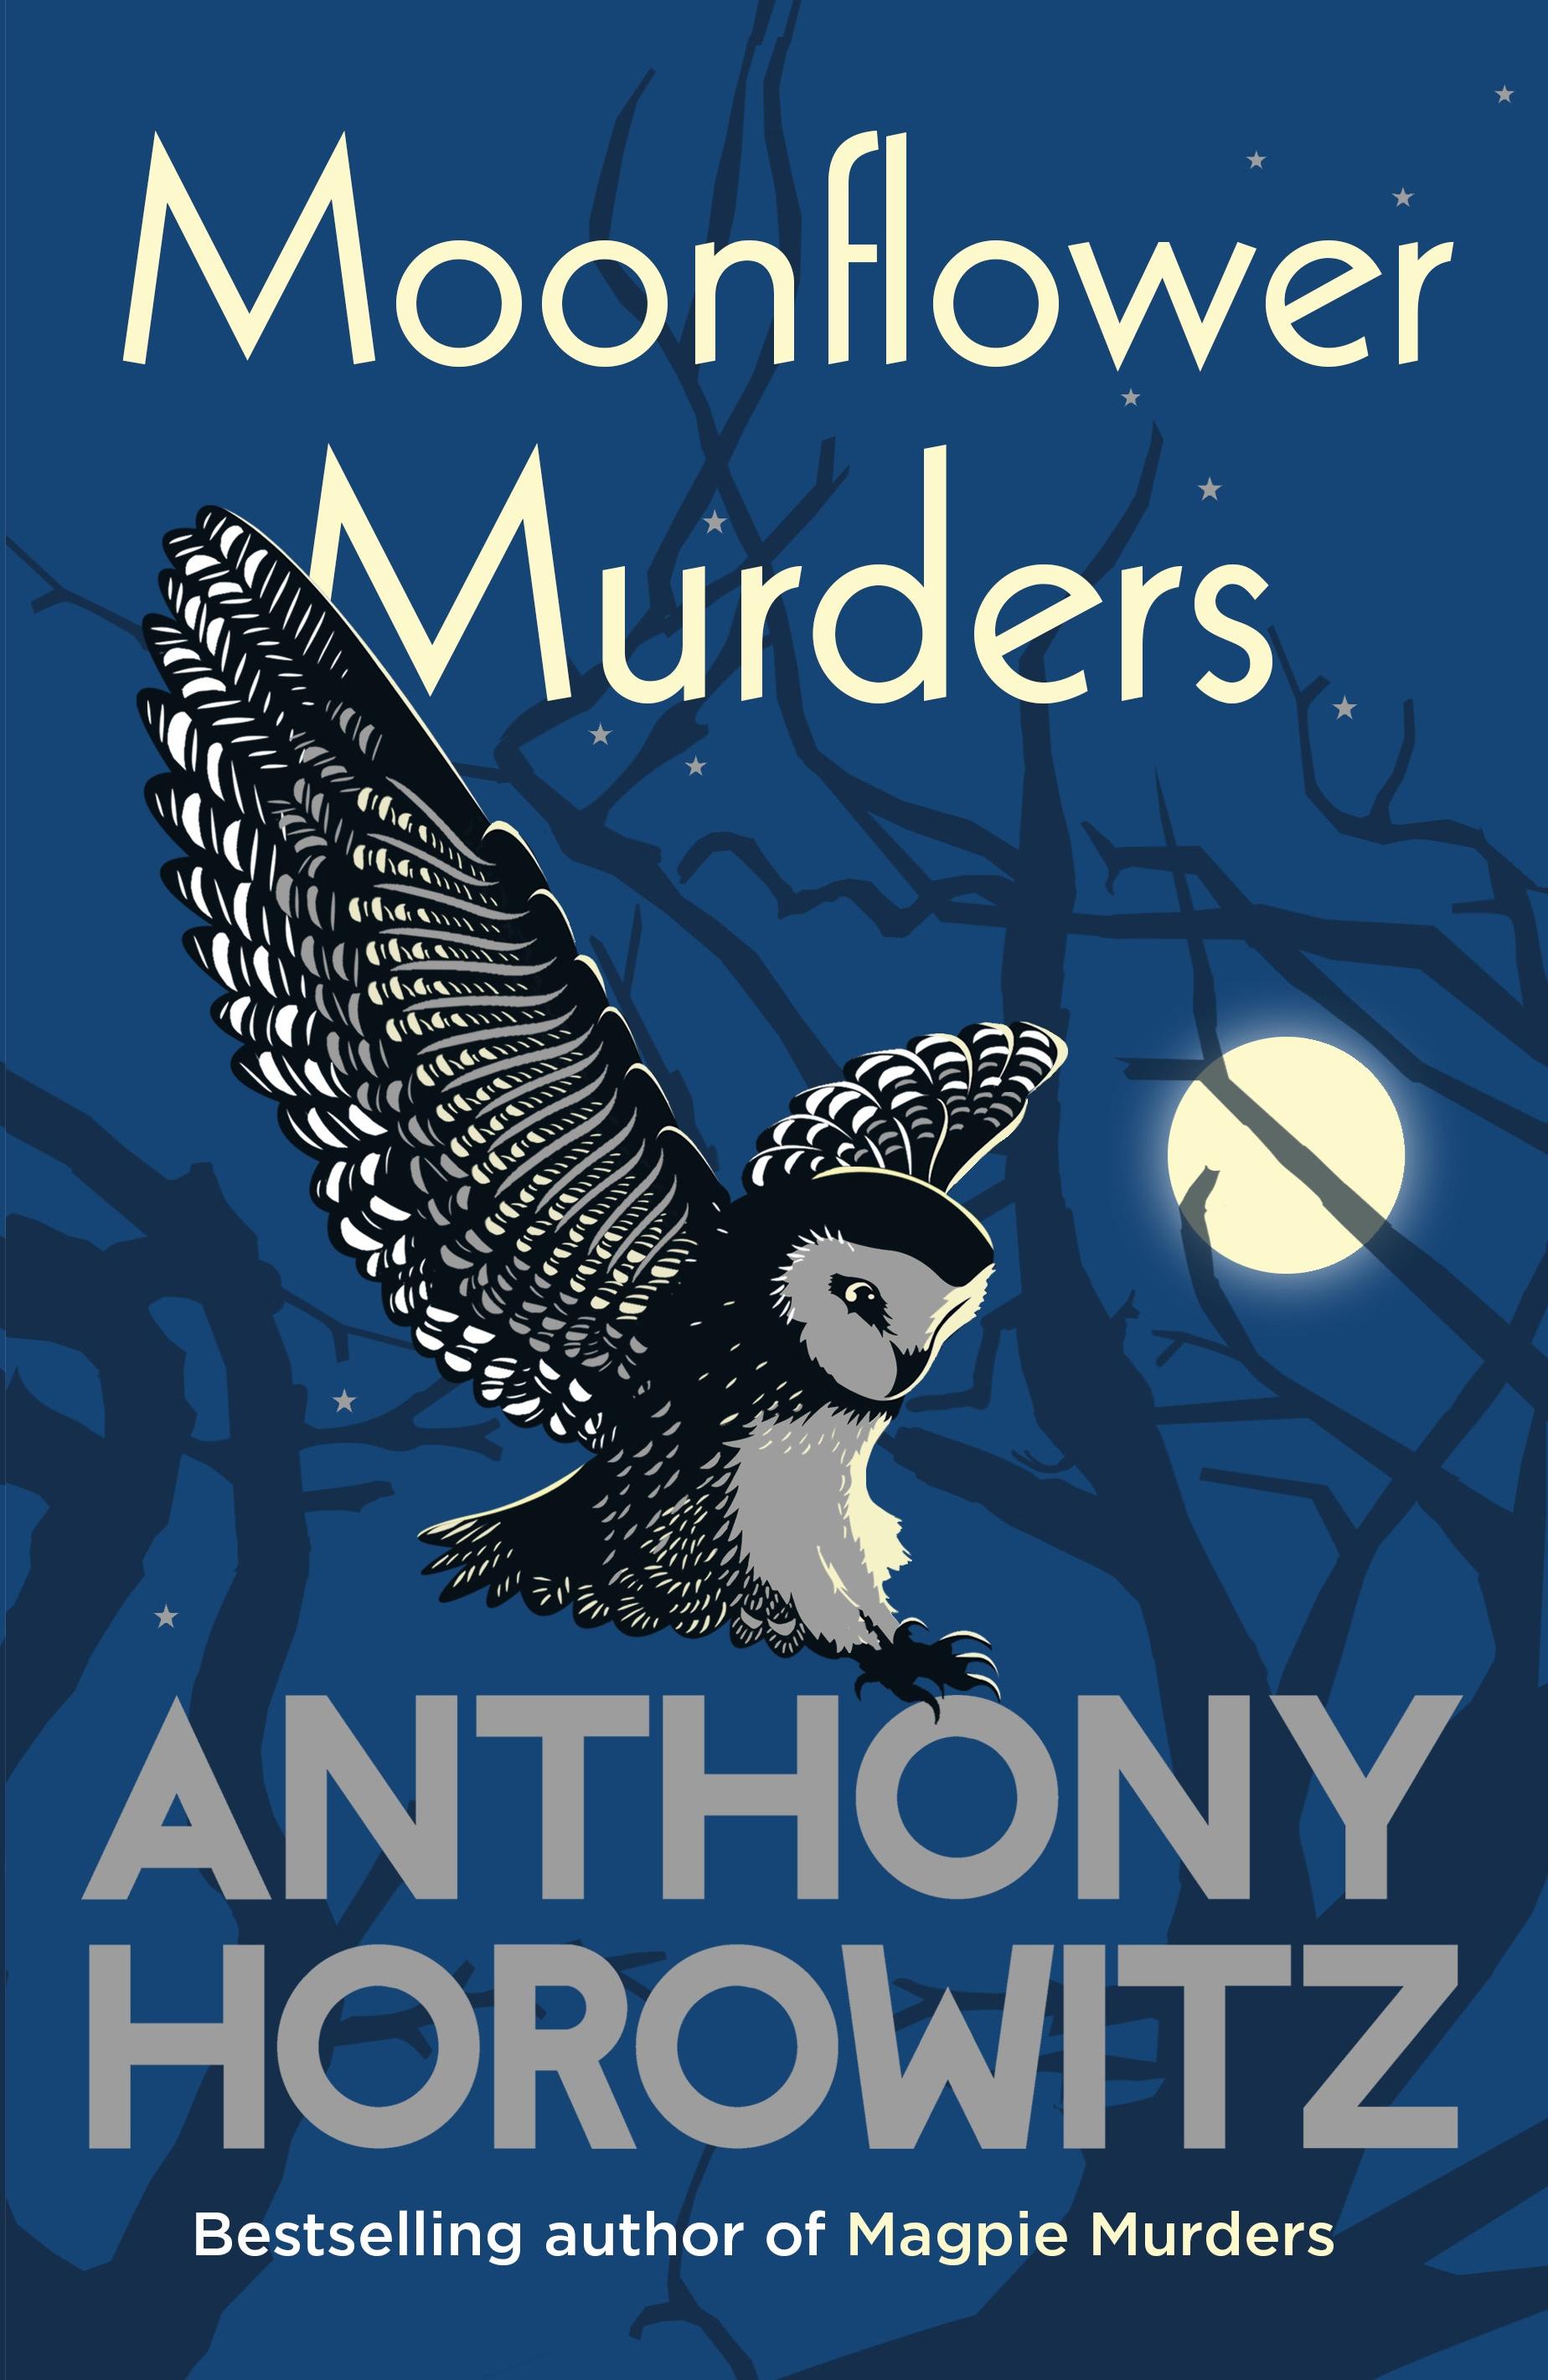 Moonflower Murders - Horowitz Anthony - 9781529124354